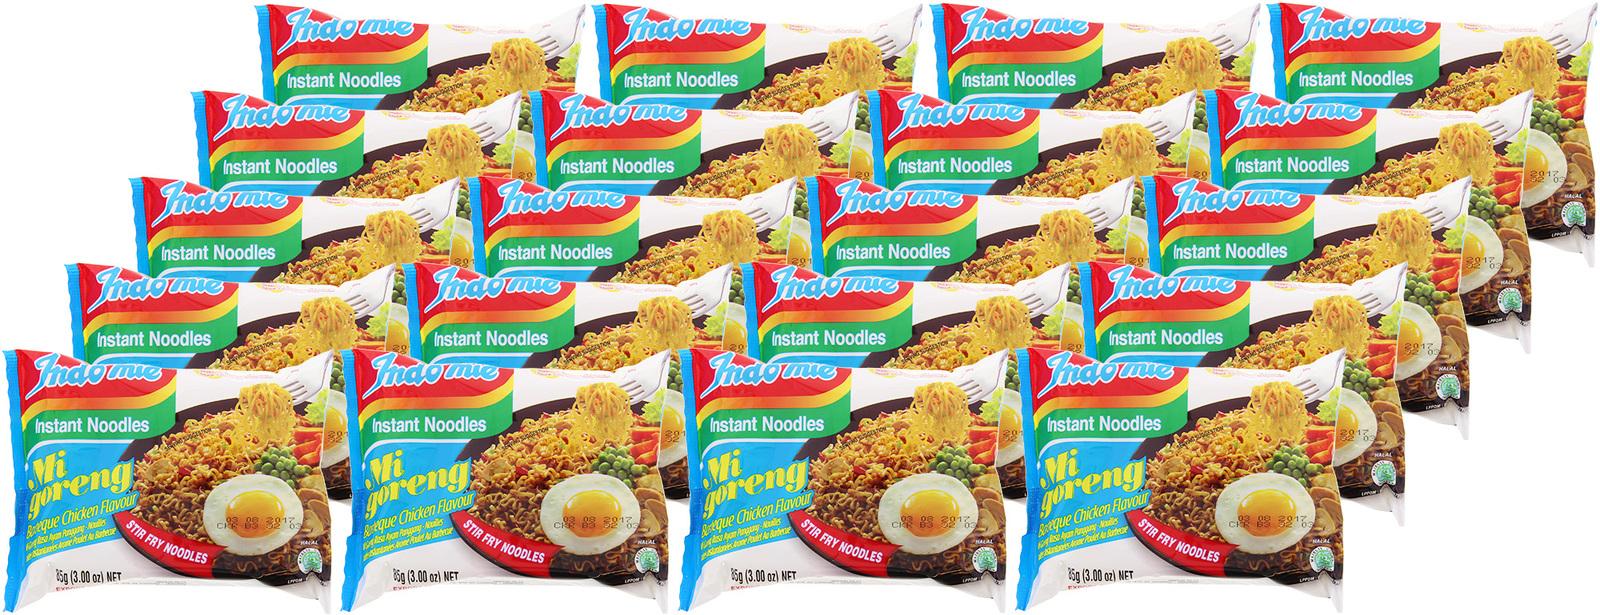 Indomie Mi Goreng Noodles - BBQ Chicken 85g (20 Pack) image